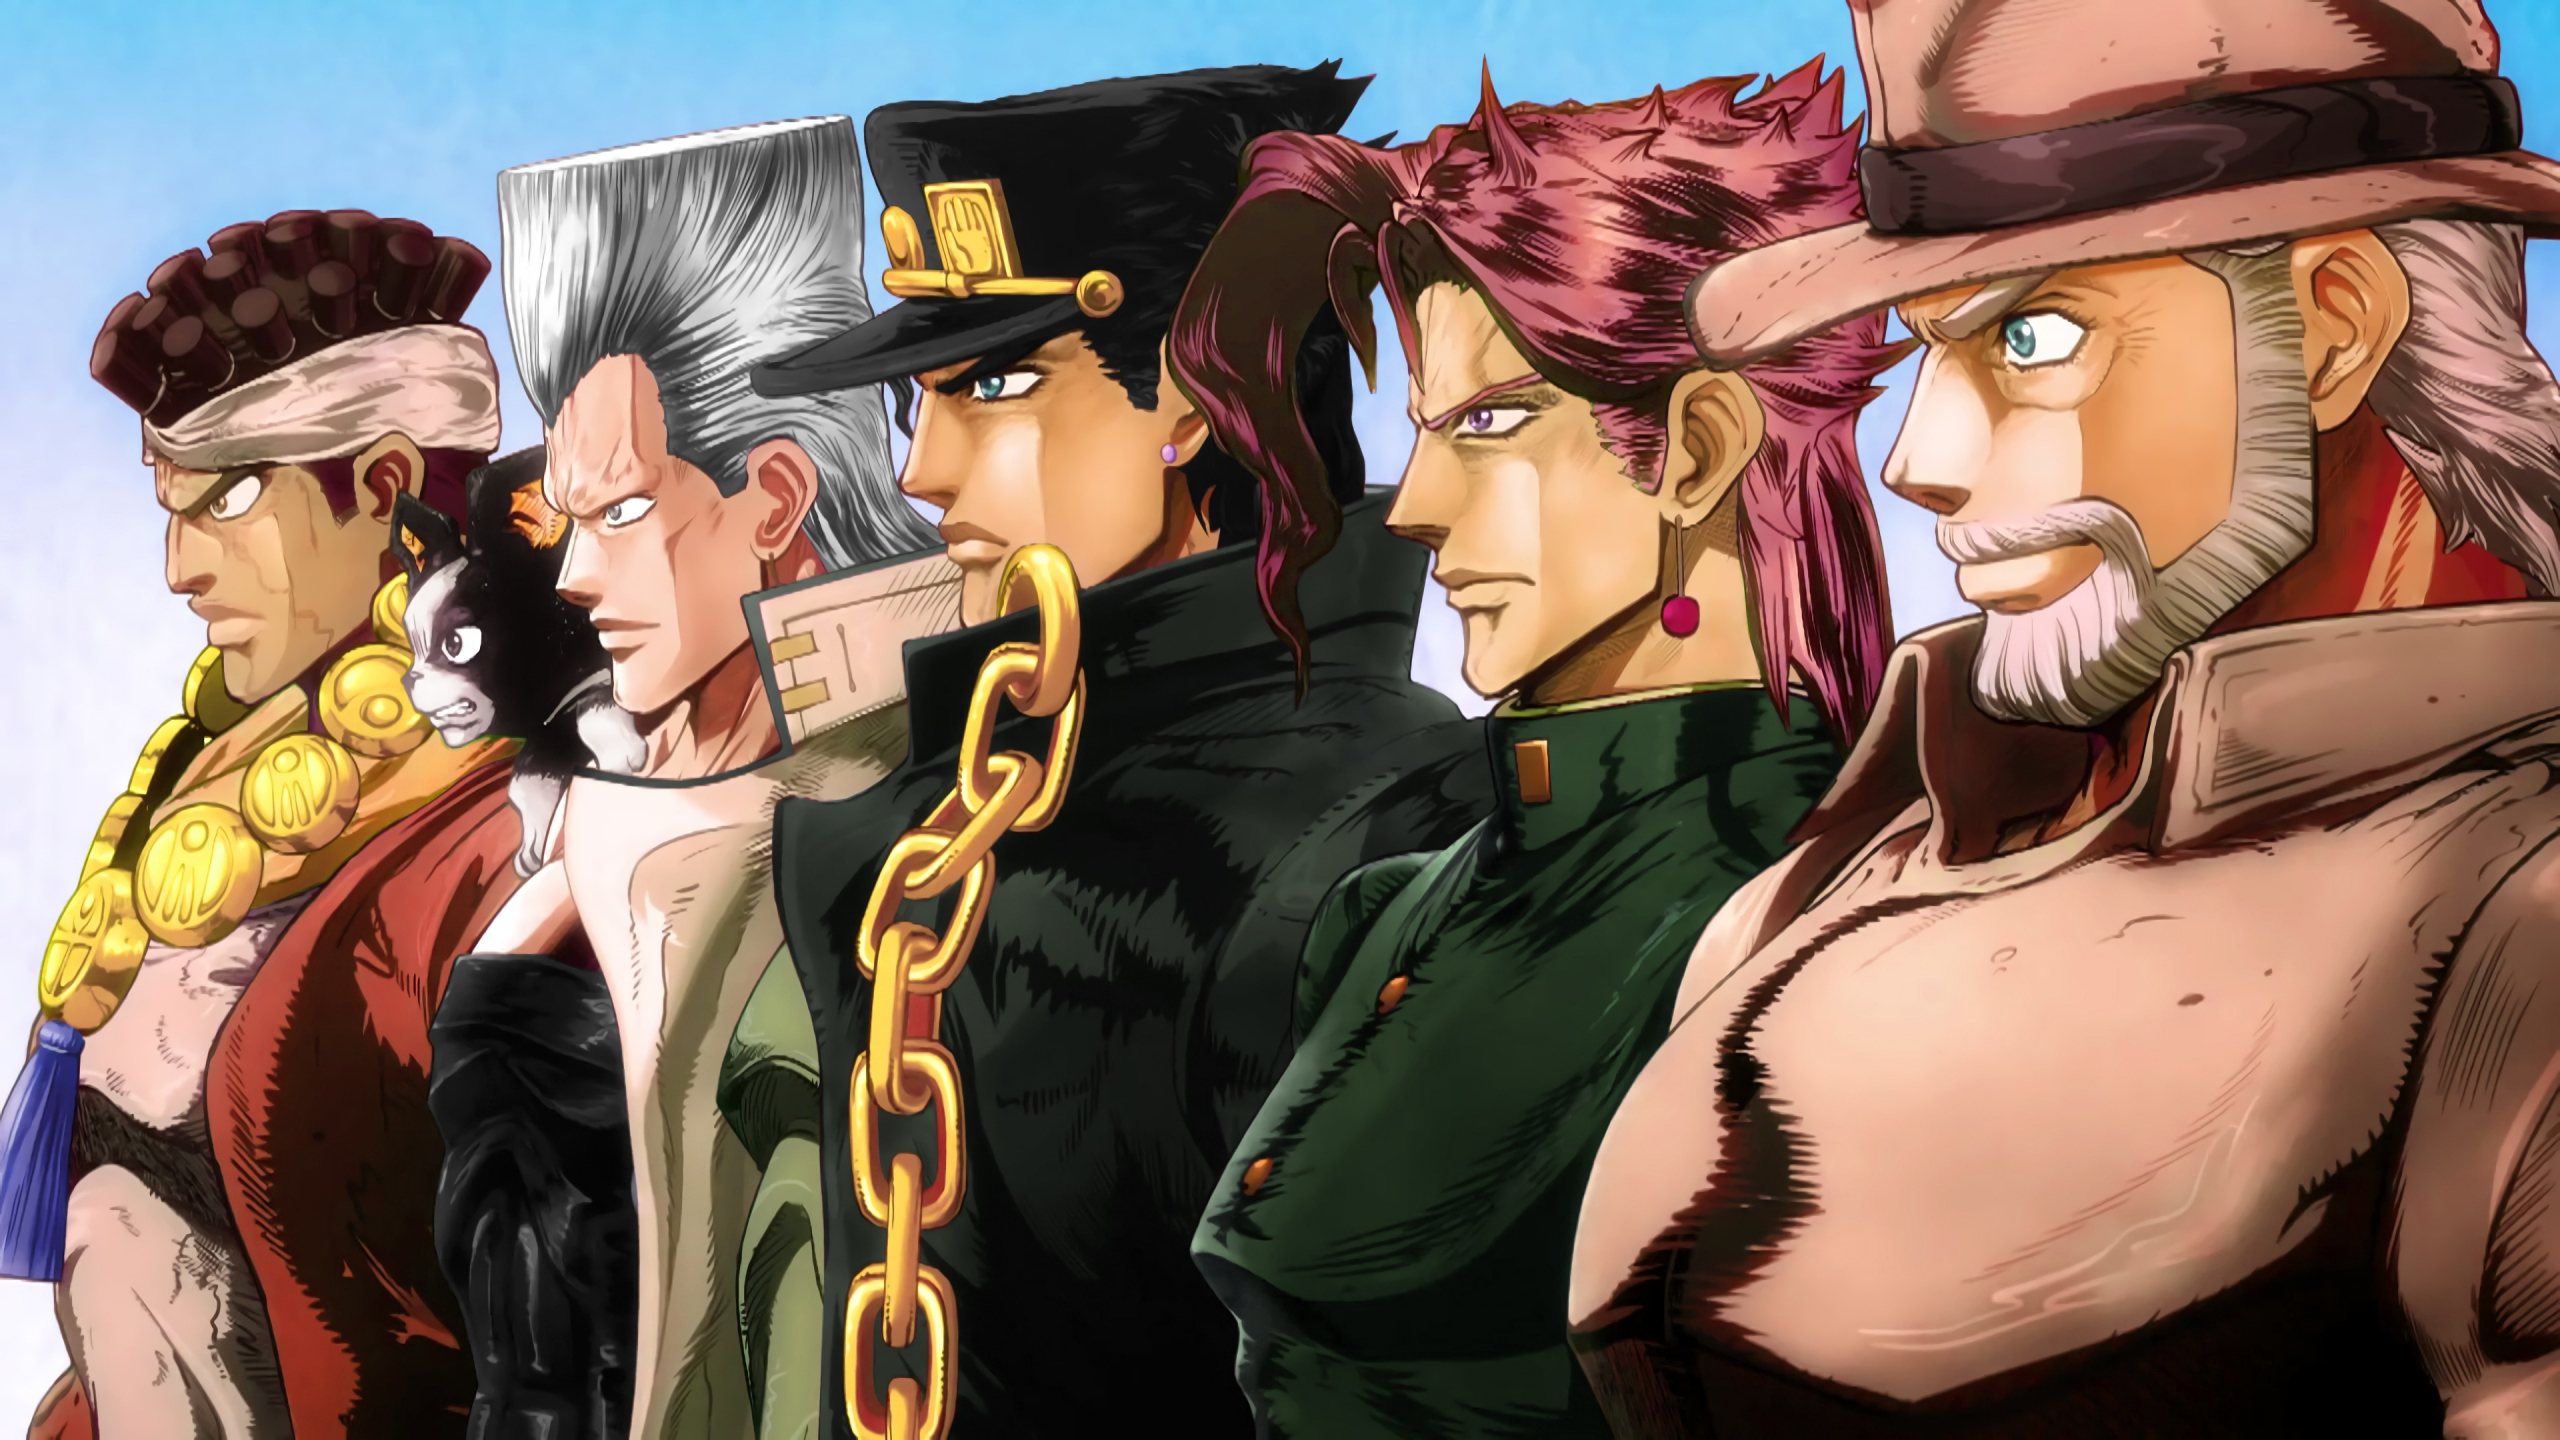 Download 2560x1440 wallpaper anime boys, jojo's bizarre ...